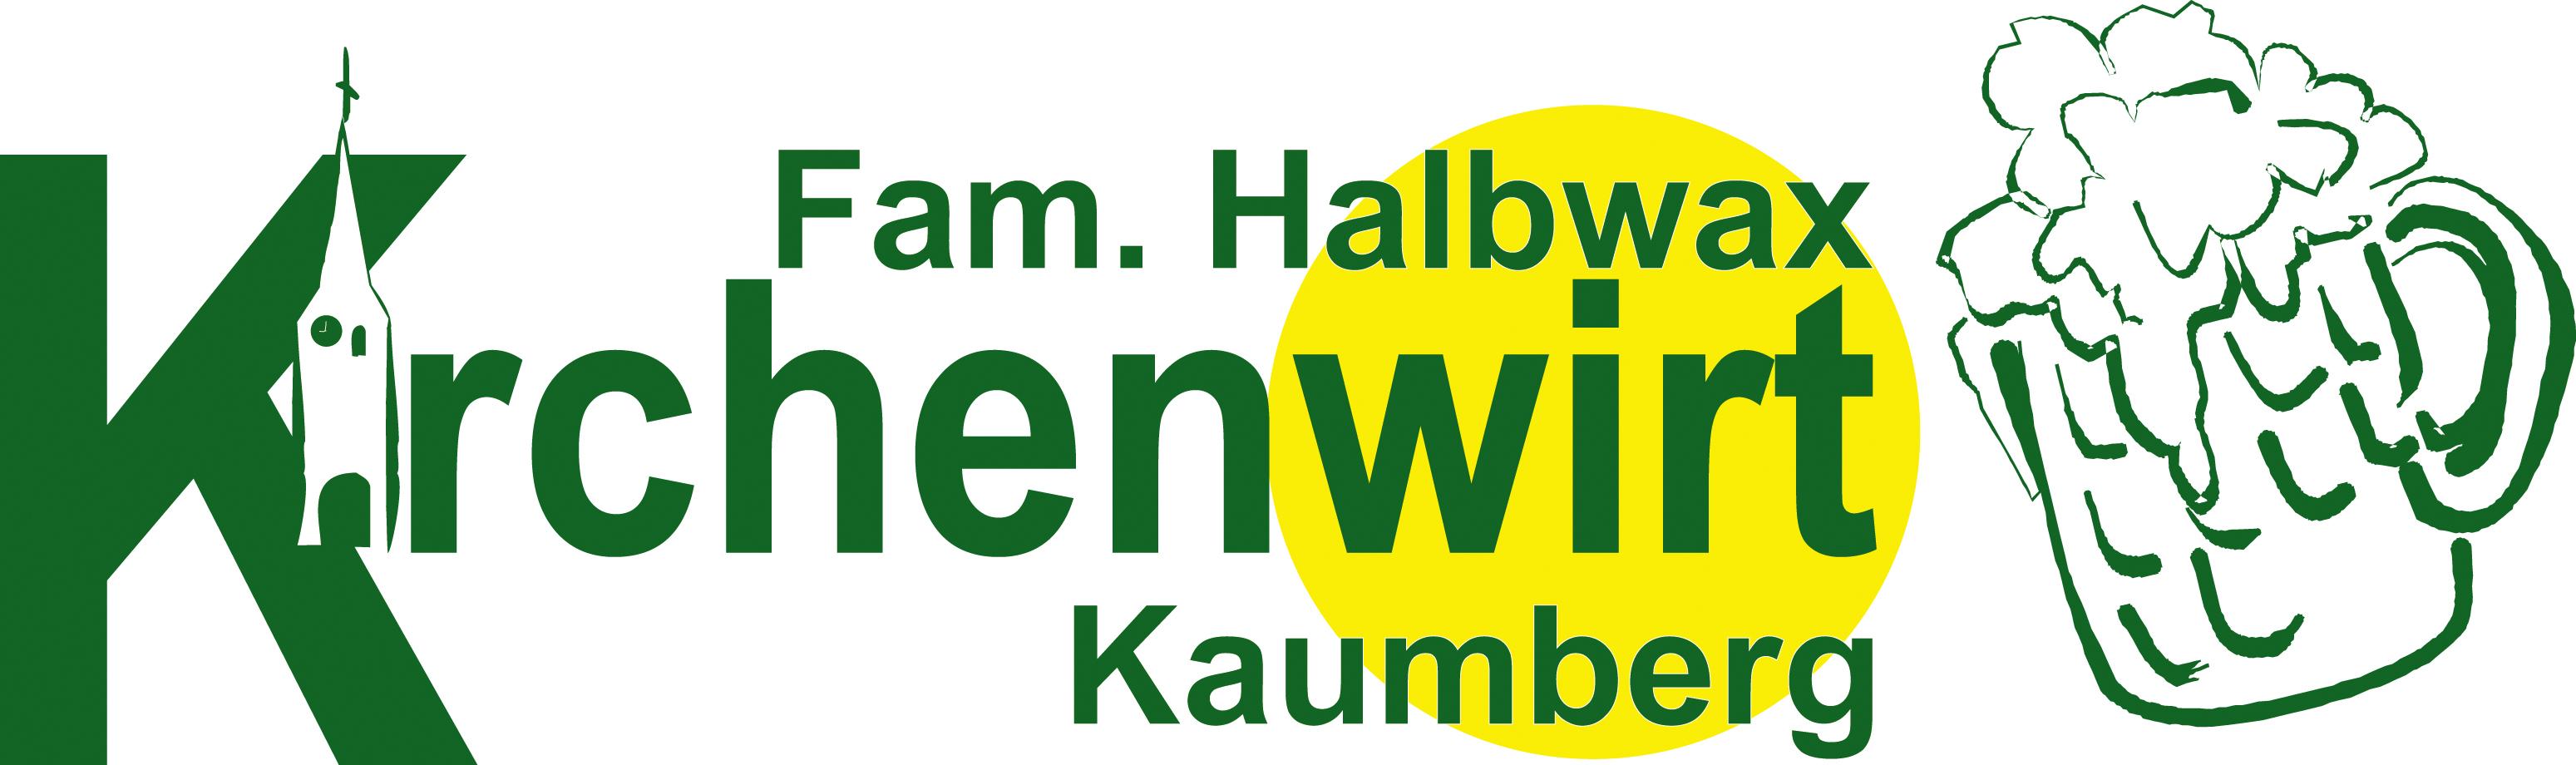 Kirchenwirt Kaumberg